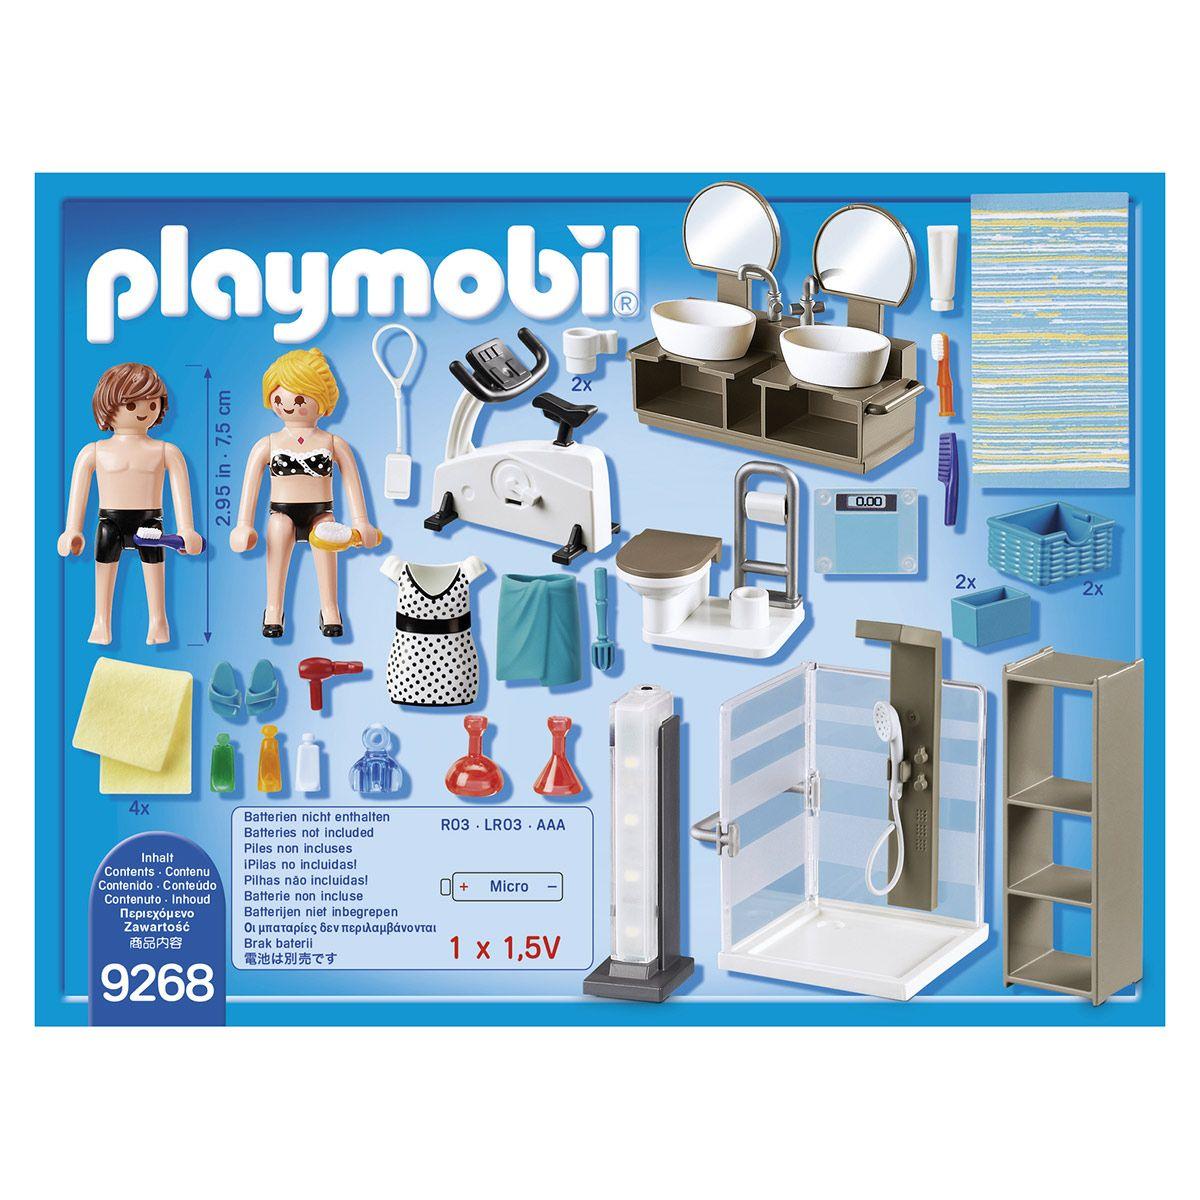 New Salle De Bains Playmobil